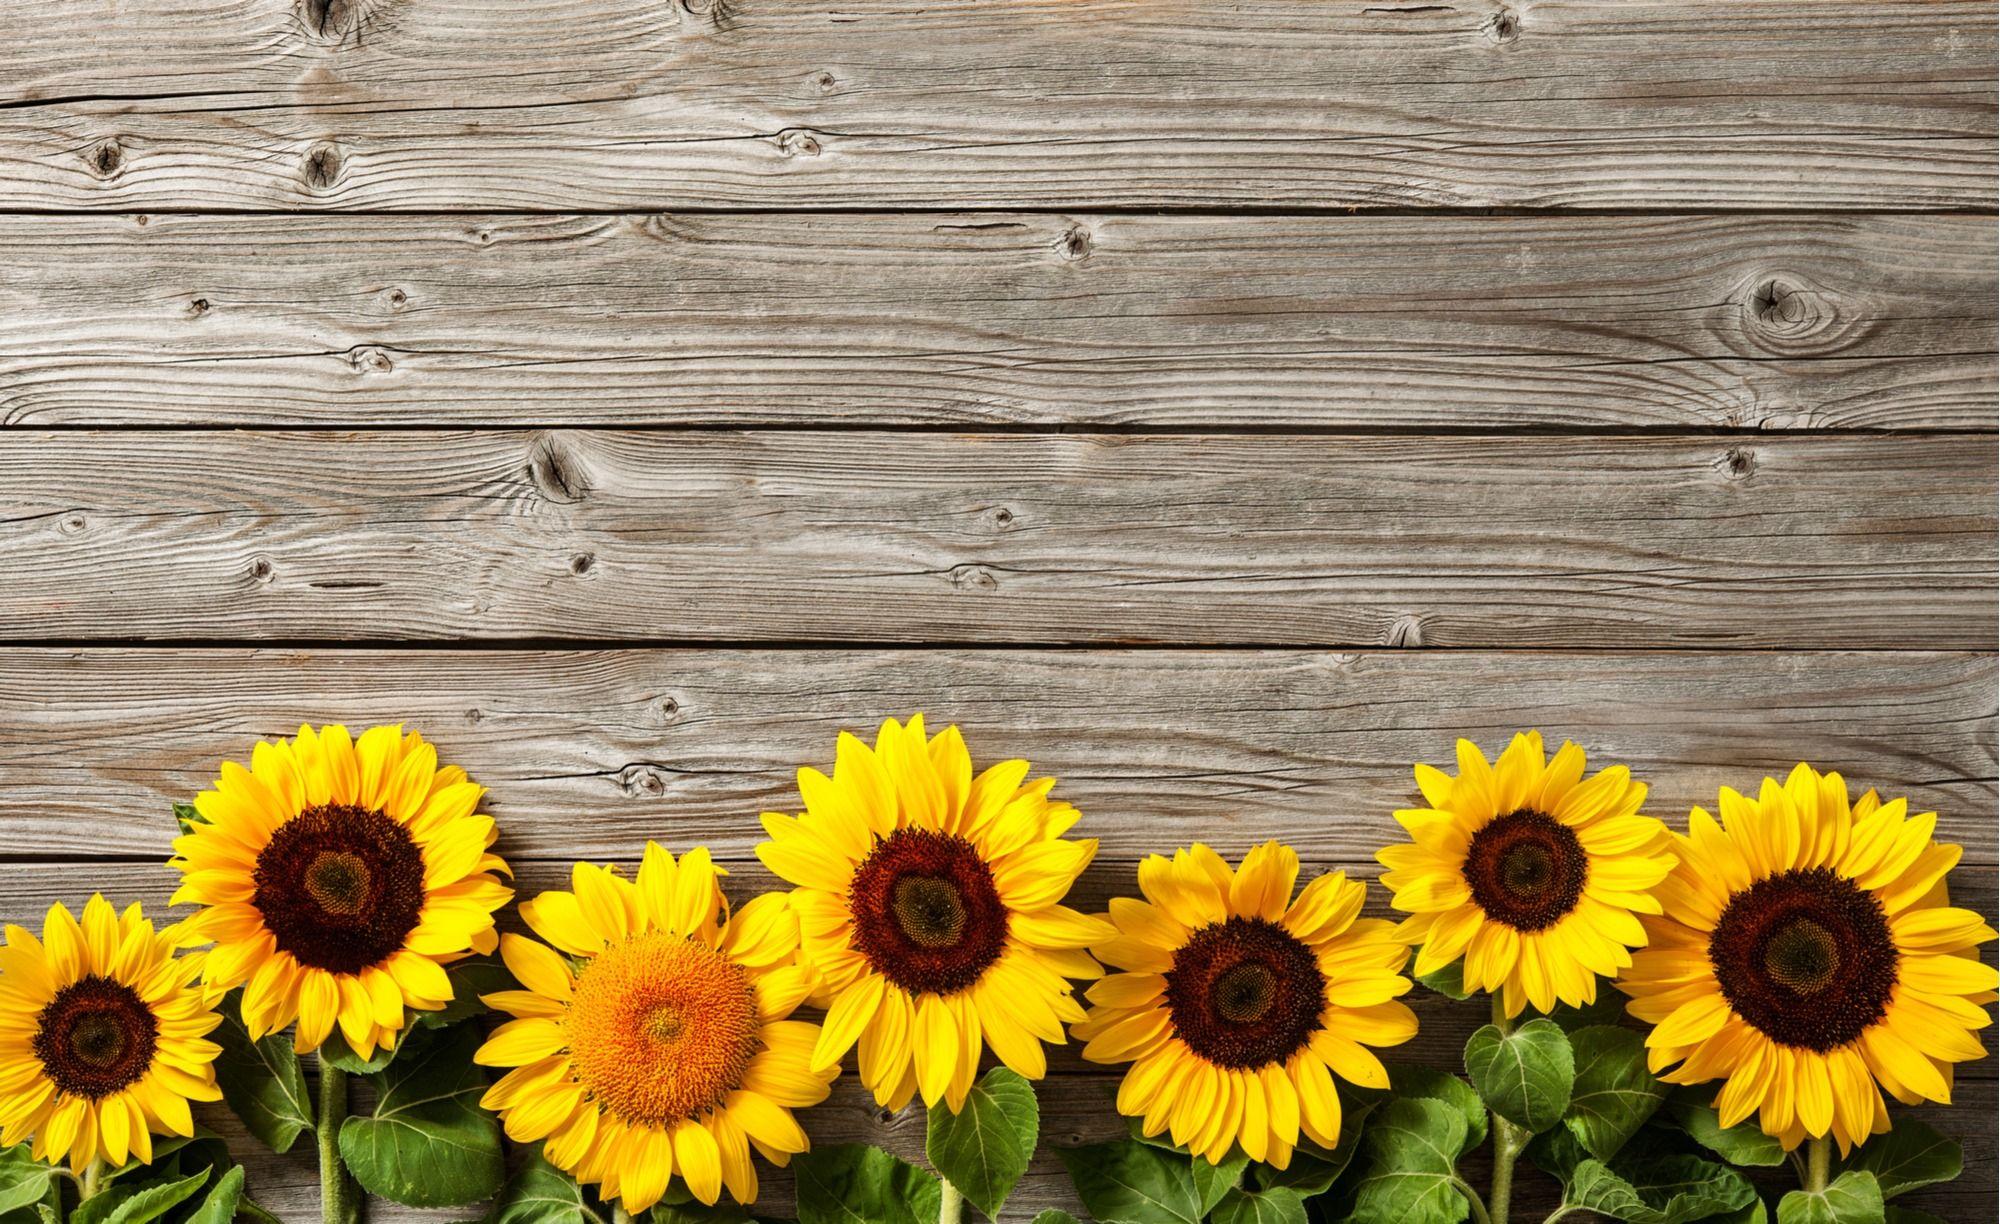 Grow Sunflowers Sunflowers Background Sunflower Wallpaper Facebook Cover Photos Vintage